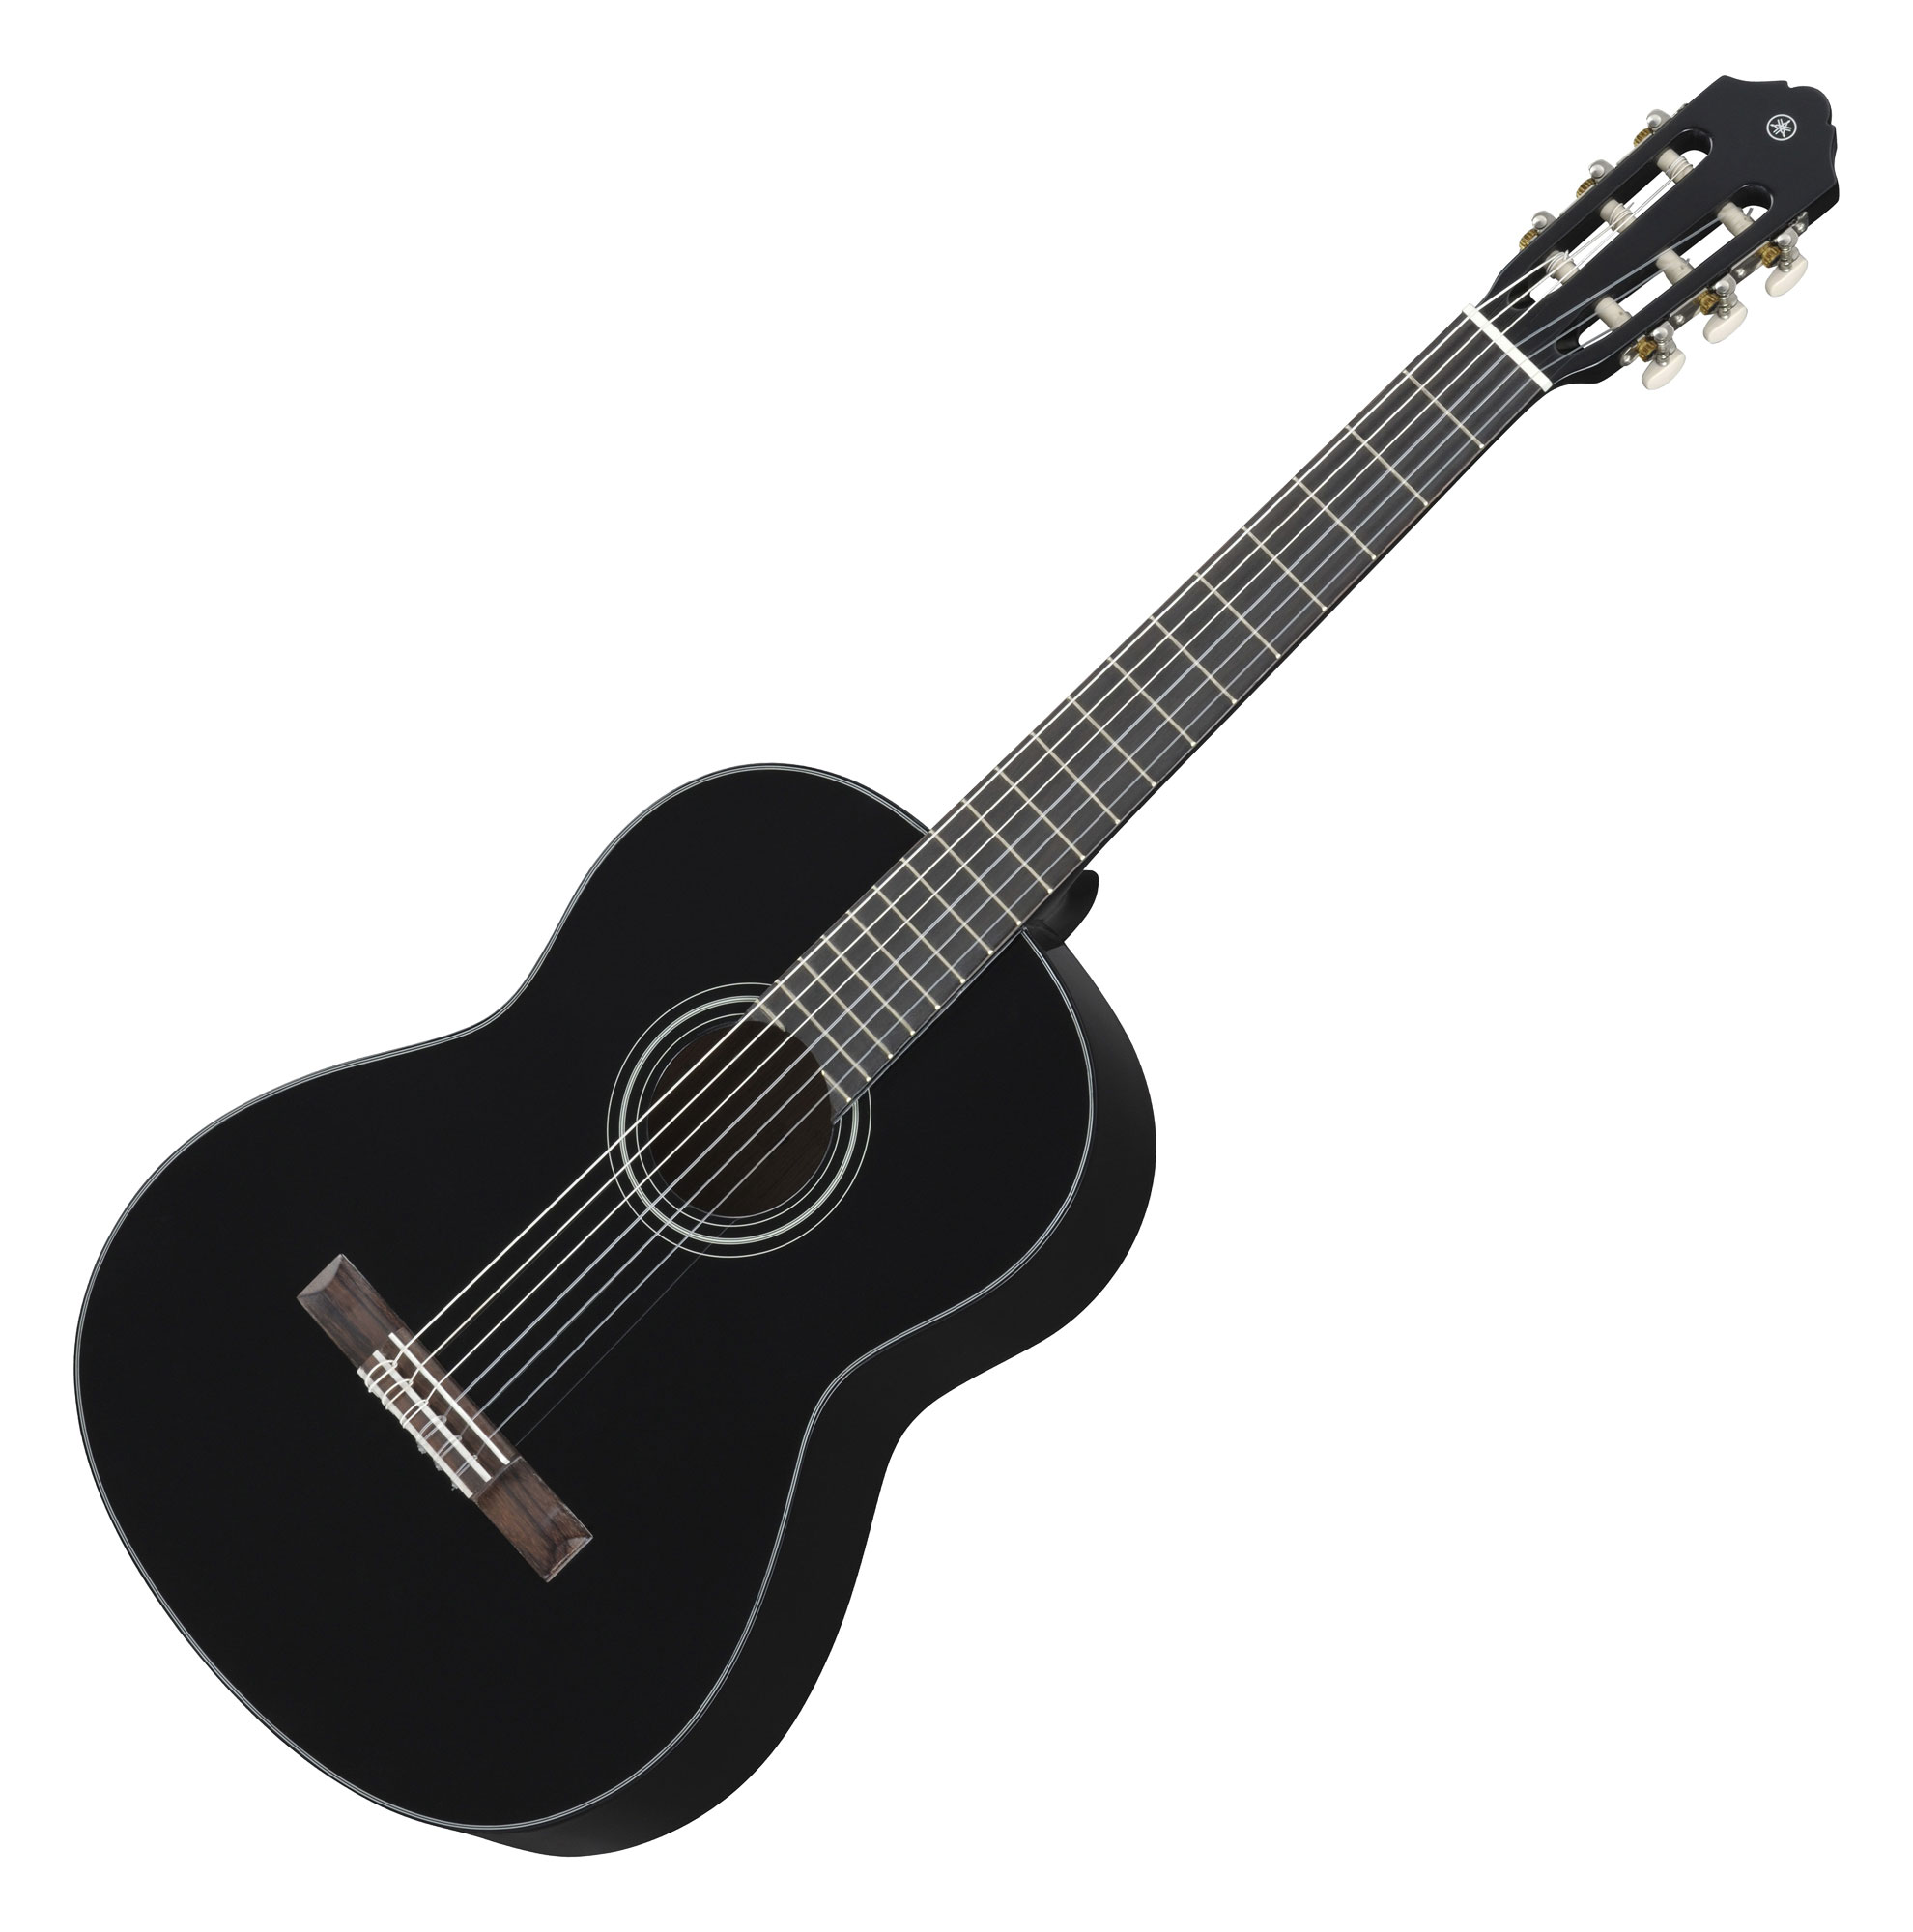 yamaha c40 bl guitarra cl sica color negro. Black Bedroom Furniture Sets. Home Design Ideas